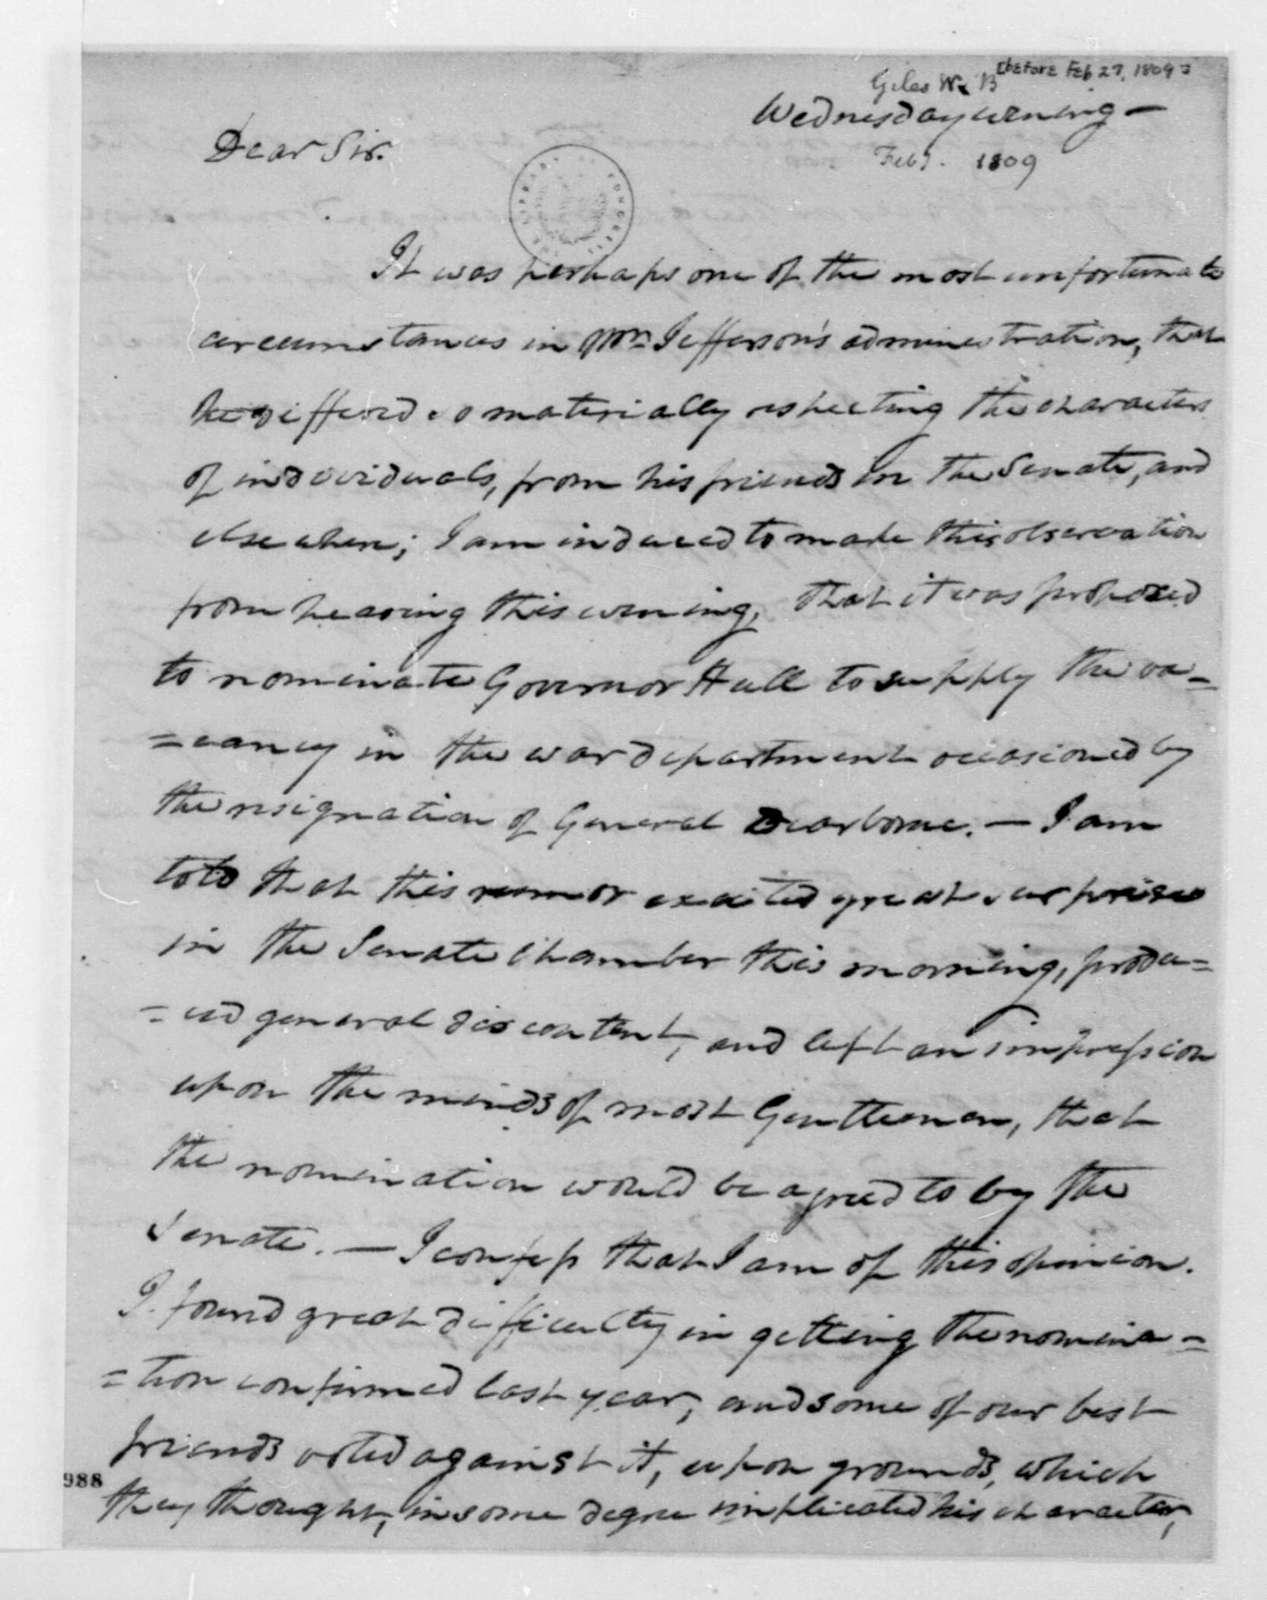 William B. Giles to James Madison, February, 1809.